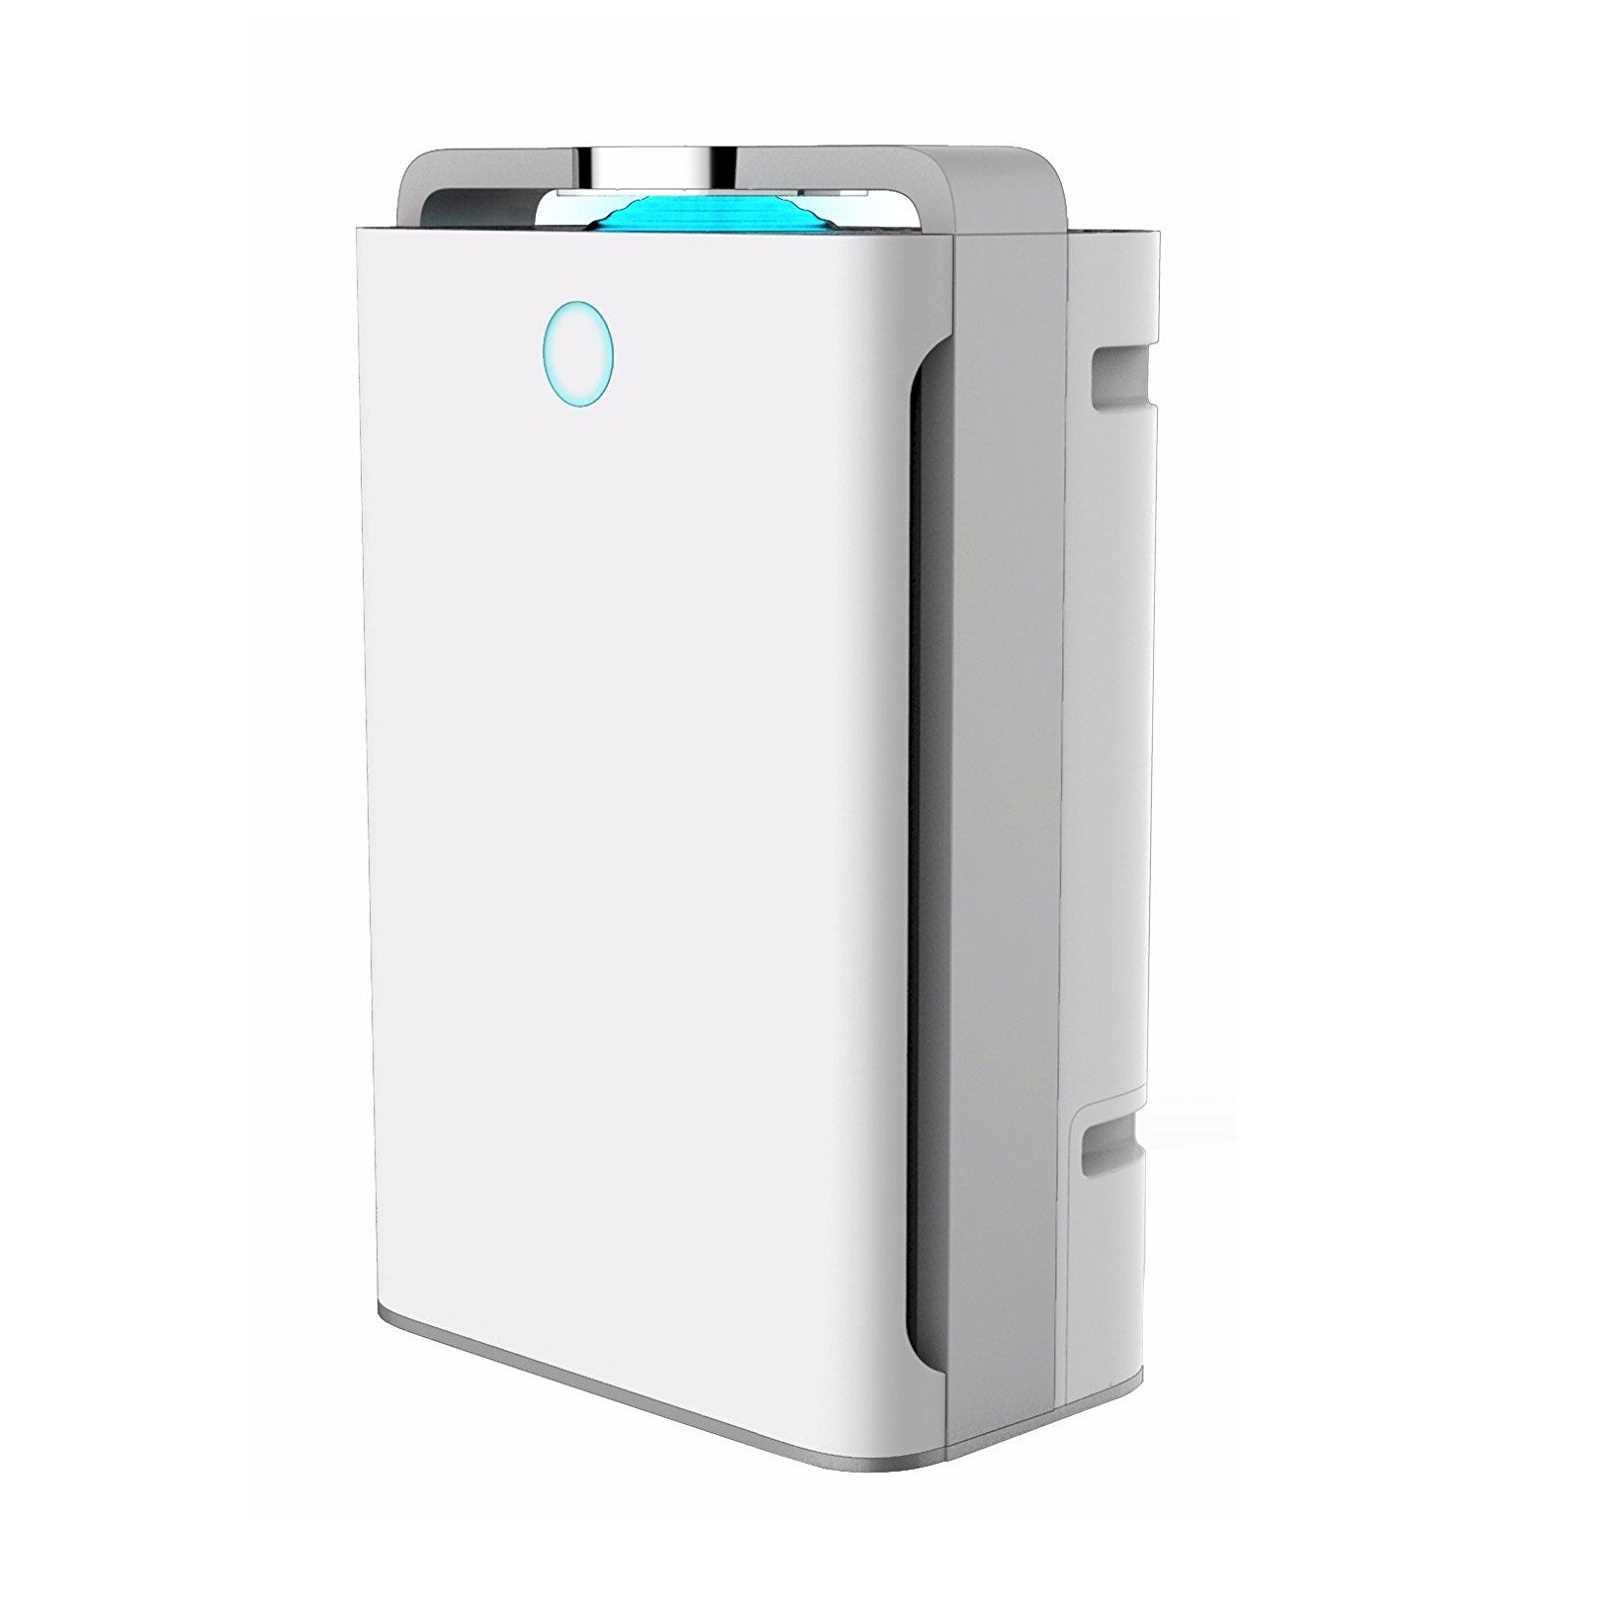 H3O VE4 Portable Room Air Purifier